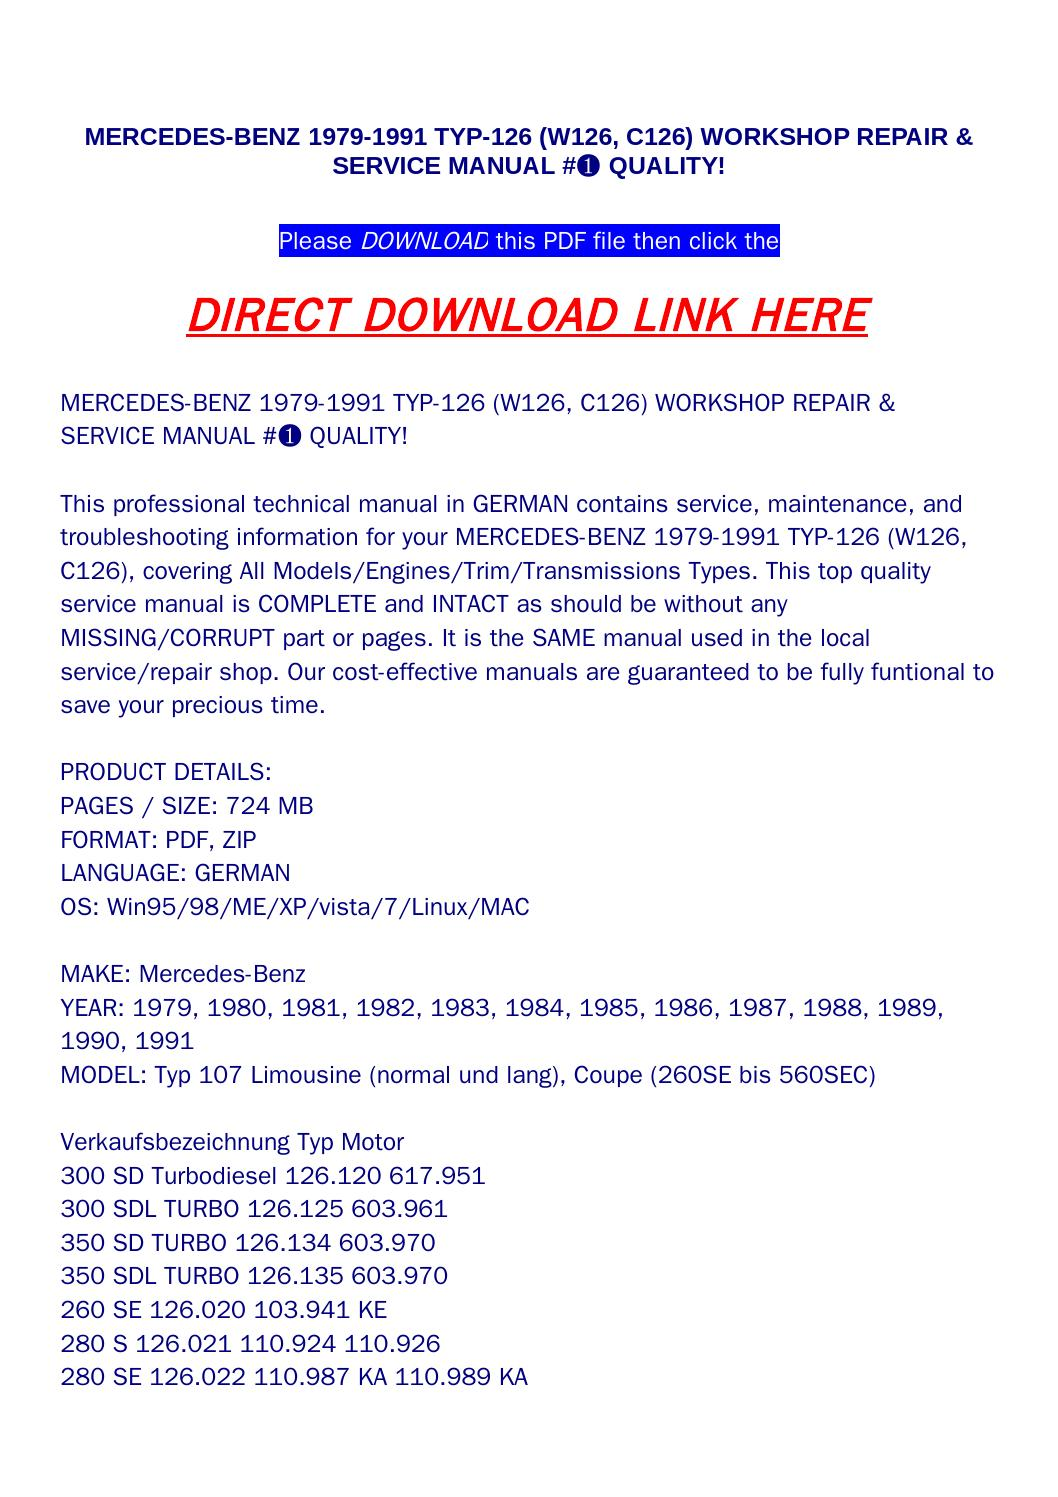 Mercedes benz 1979 1991 typ 126 (w126, c126) workshop repair & service  manual #➀ quality! by bonus300 - issuu